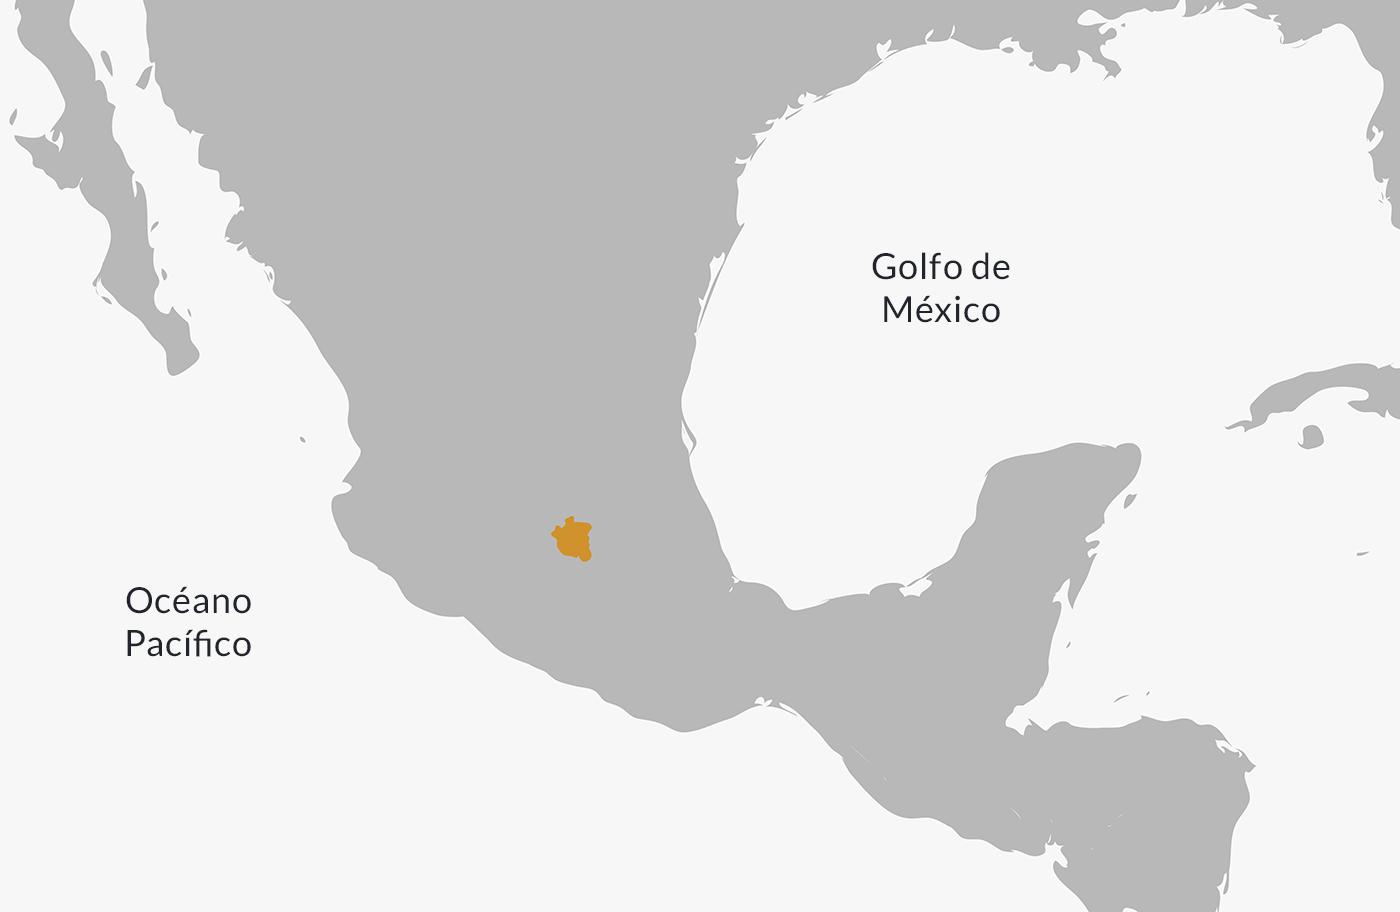 Teotihuacán Civilization: Characteristics, Culture & History